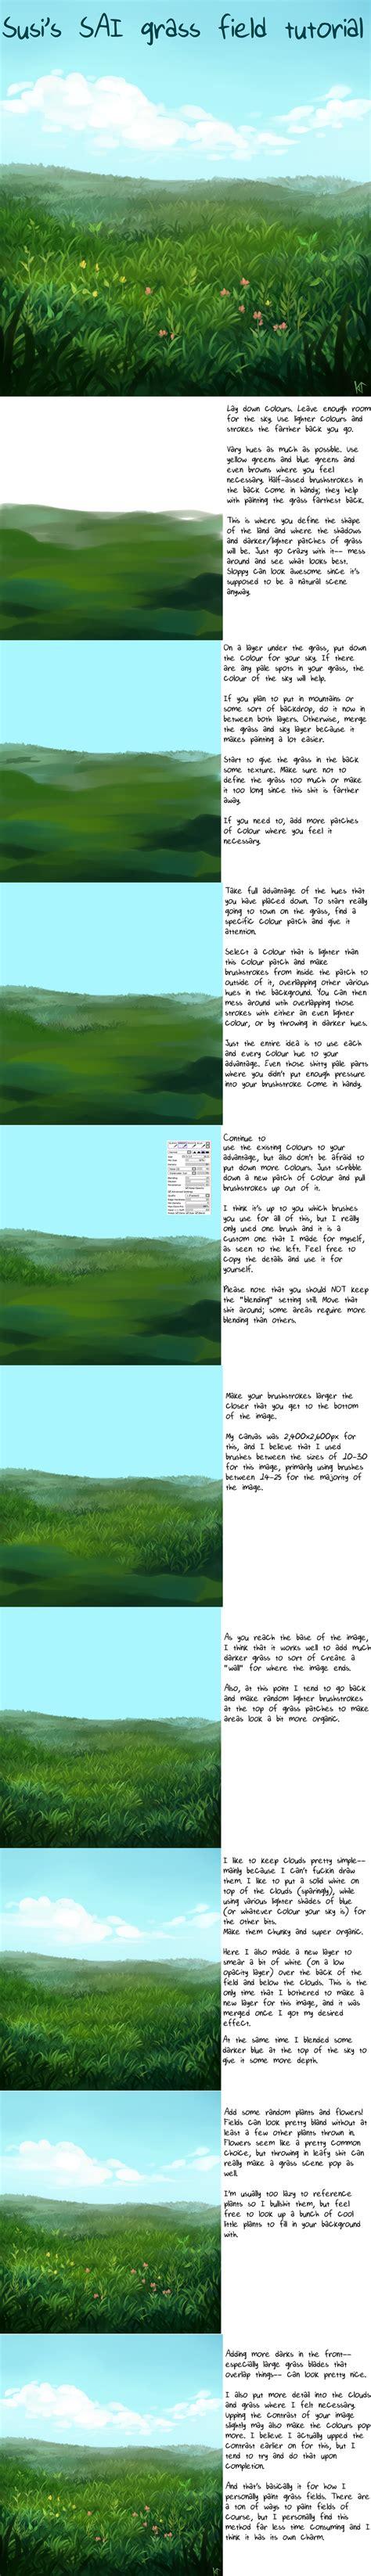 paint tool sai grass pe background tutorials by rydi1689 on deviantart